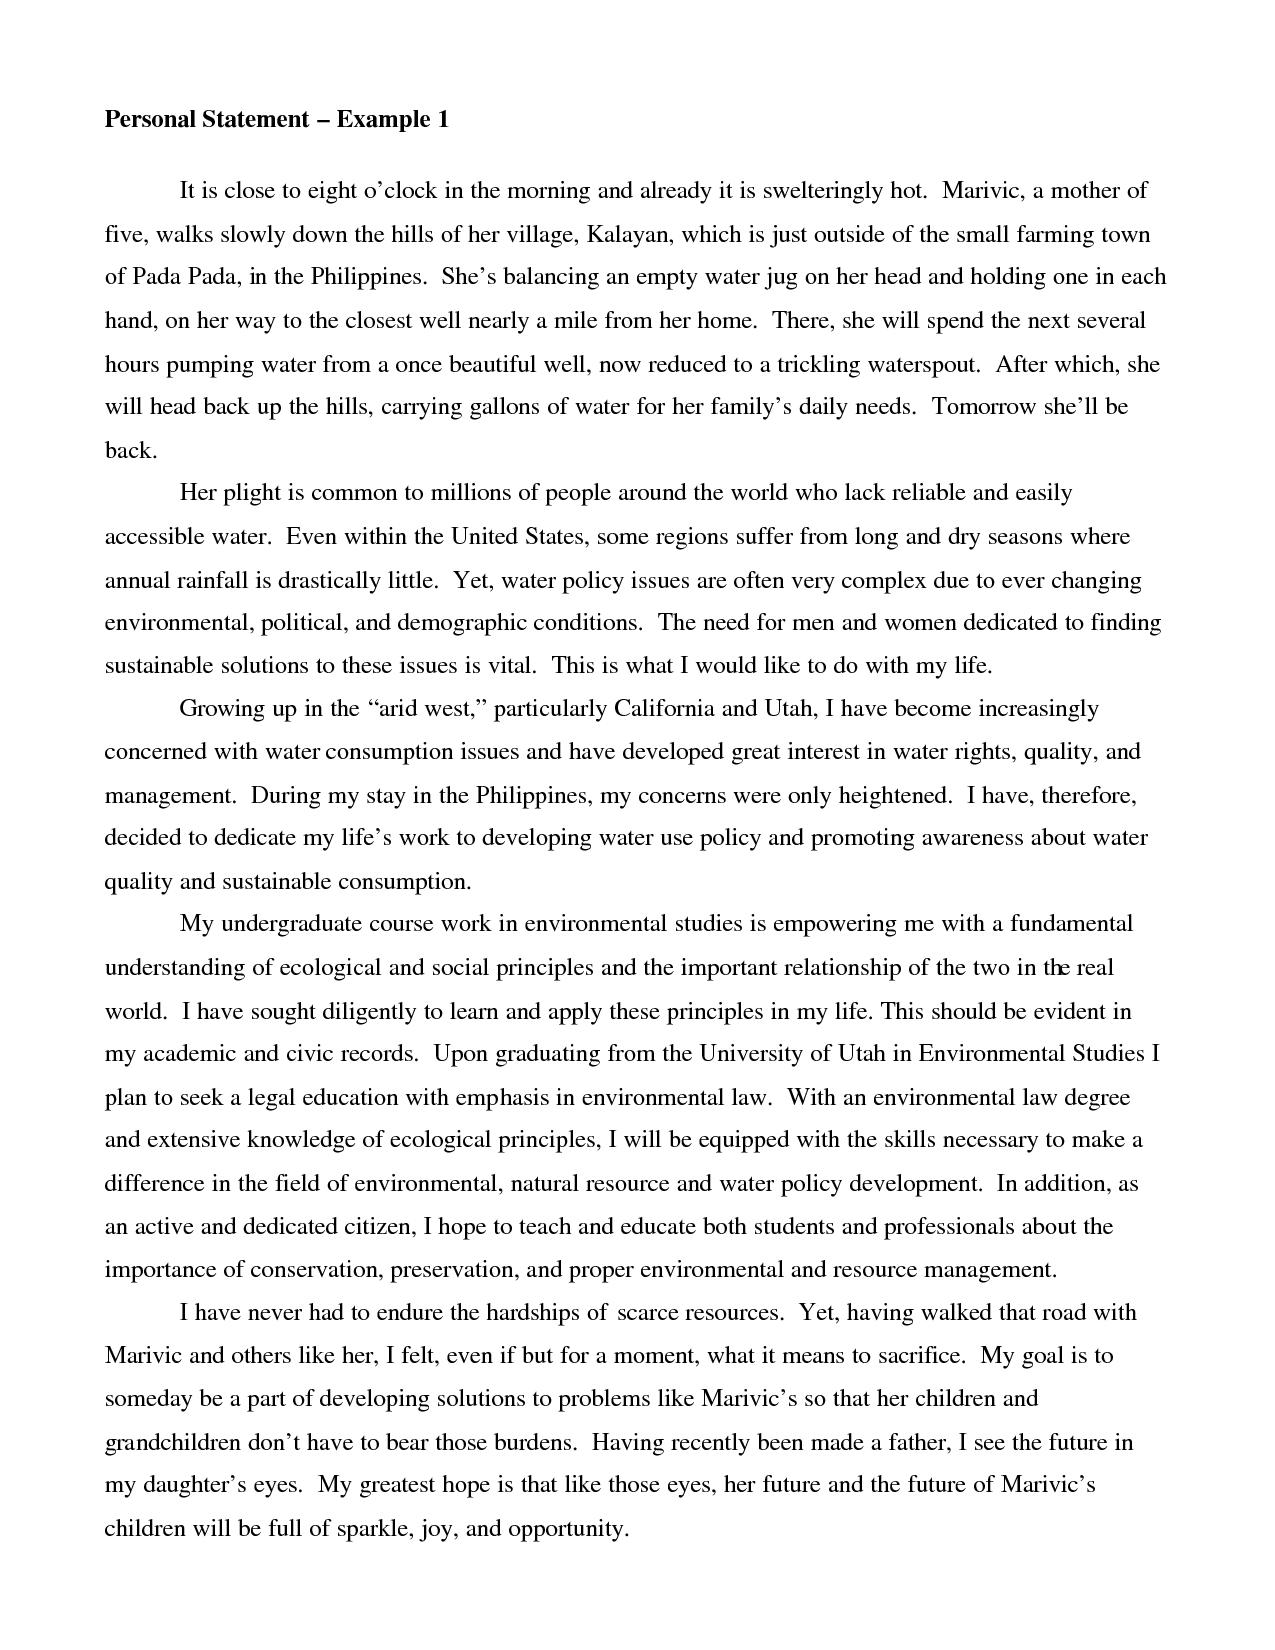 008 Professional Argumentative Essay Writing Service For School Example Free Impressive Essays Full